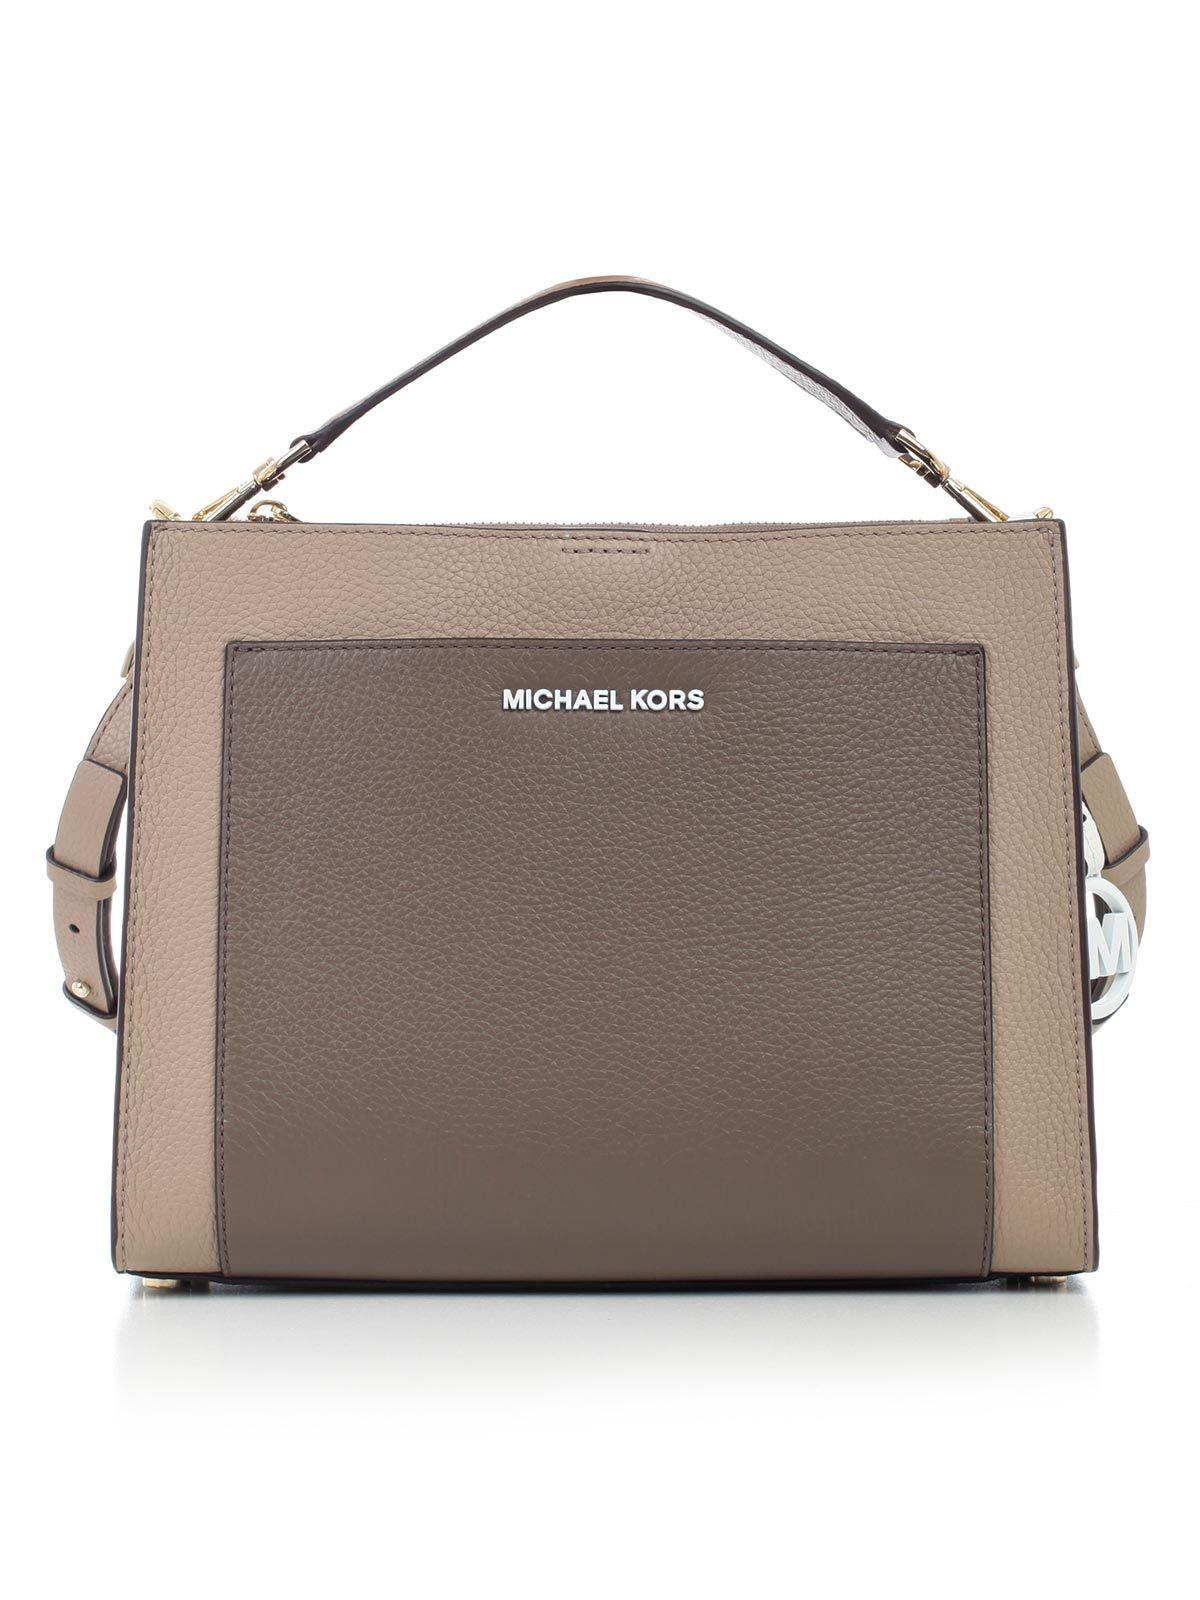 9864e3f877b93d MICHAEL Michael Kors Gemma Shoulder Bag in Brown - Lyst